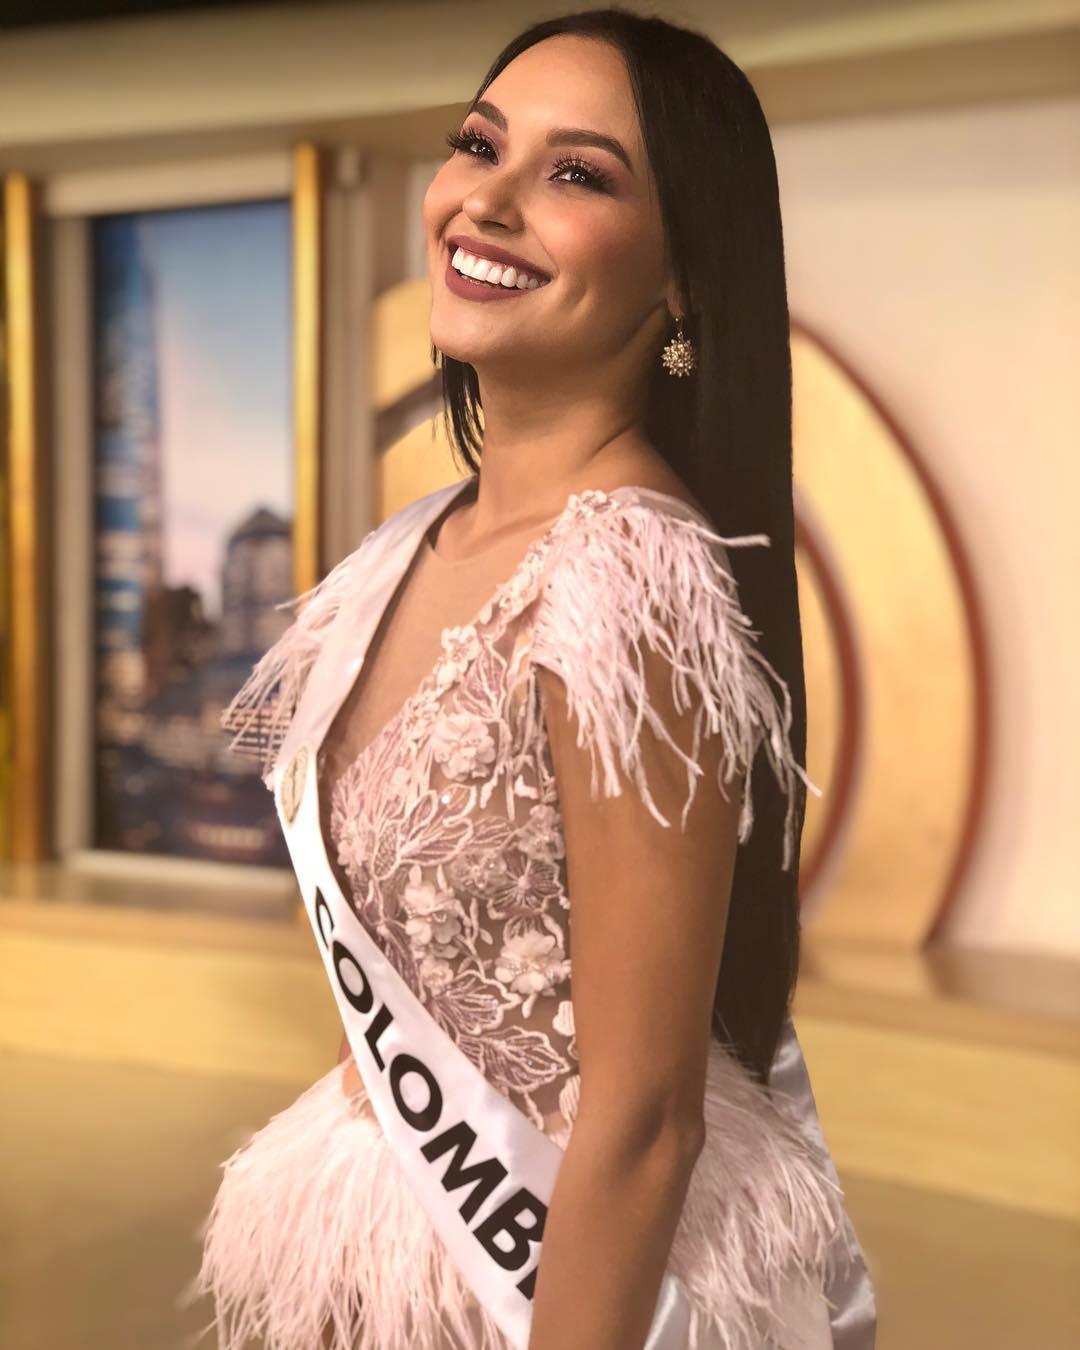 hillary hollman, 3rd runner-up de miss intercontinental 2018-2019. - Página 5 49421912